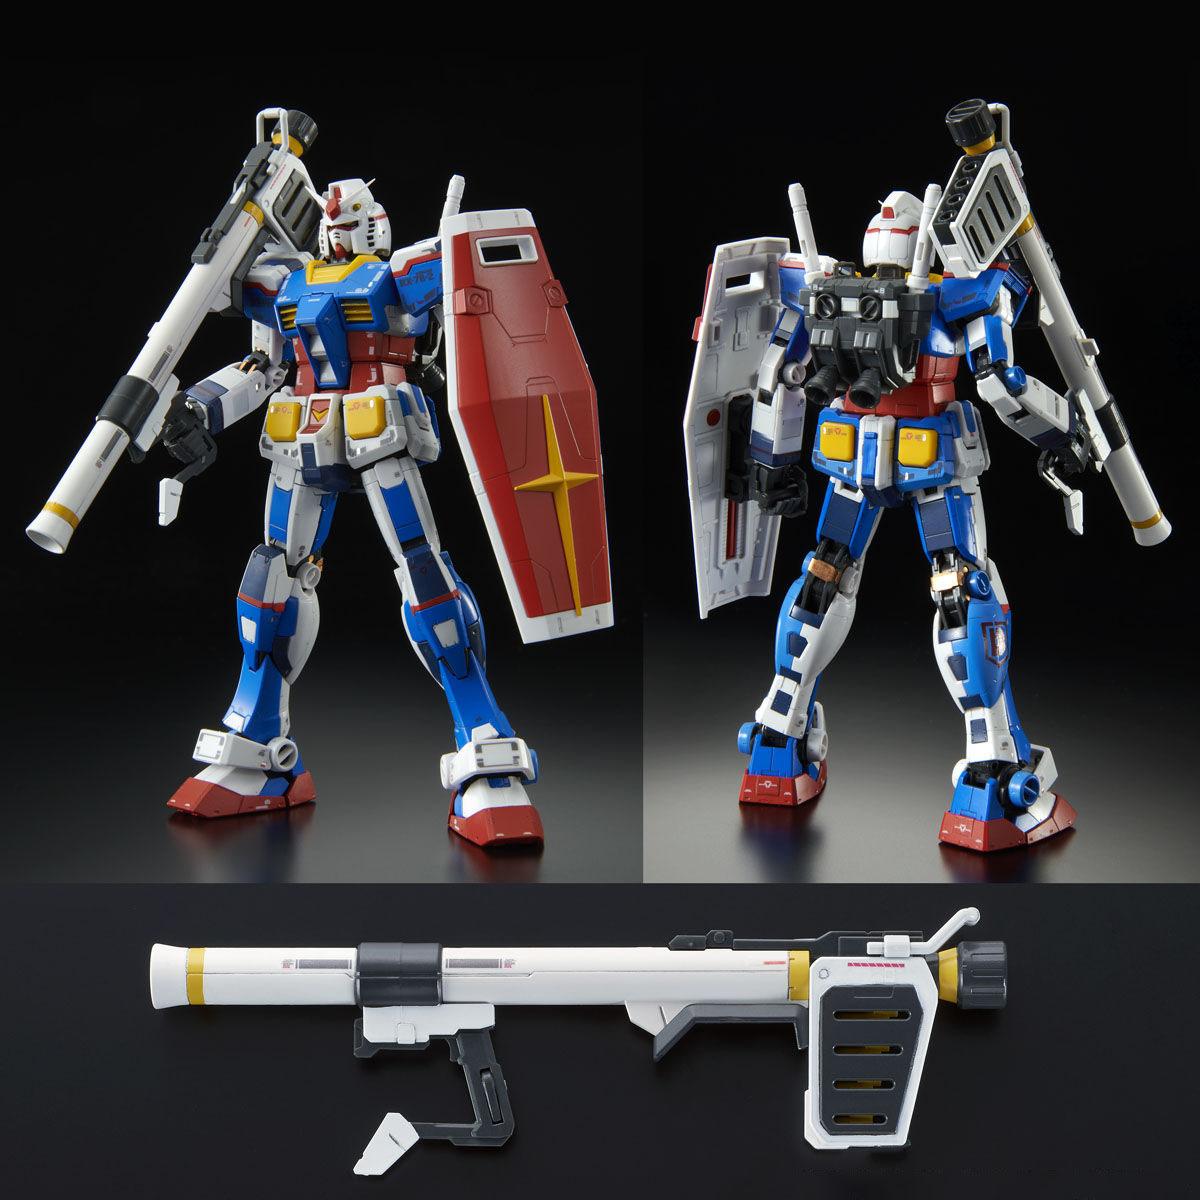 RG 1/144 RX-78-2 GUNDAM (TEAM BRIGHT CUSTOM)